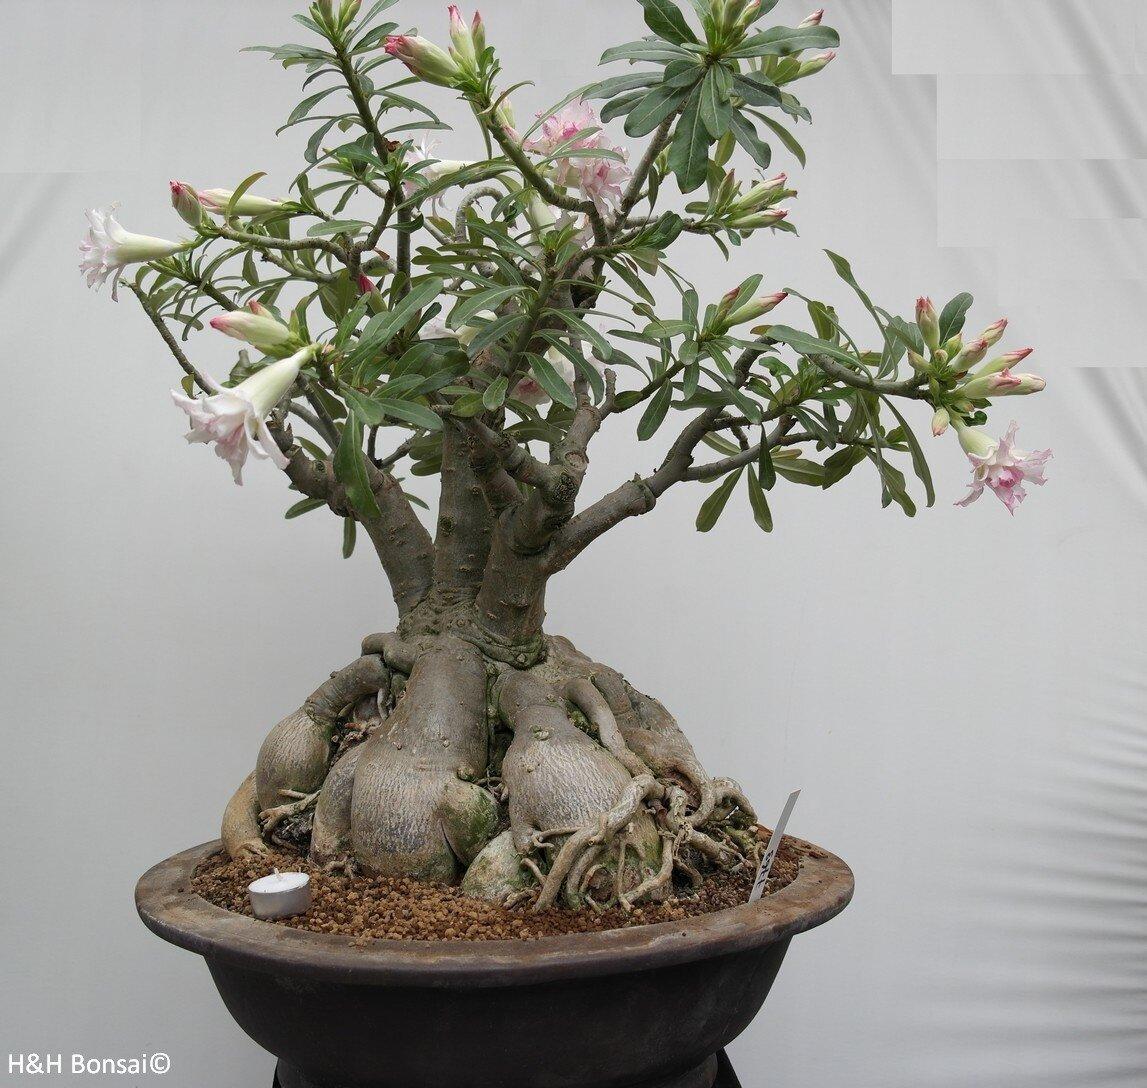 Adenium Obesum Bonsai Seeds Global Seeds 20pcs Seeds Buy Online At Best Prices In Bangladesh Daraz Com Bd